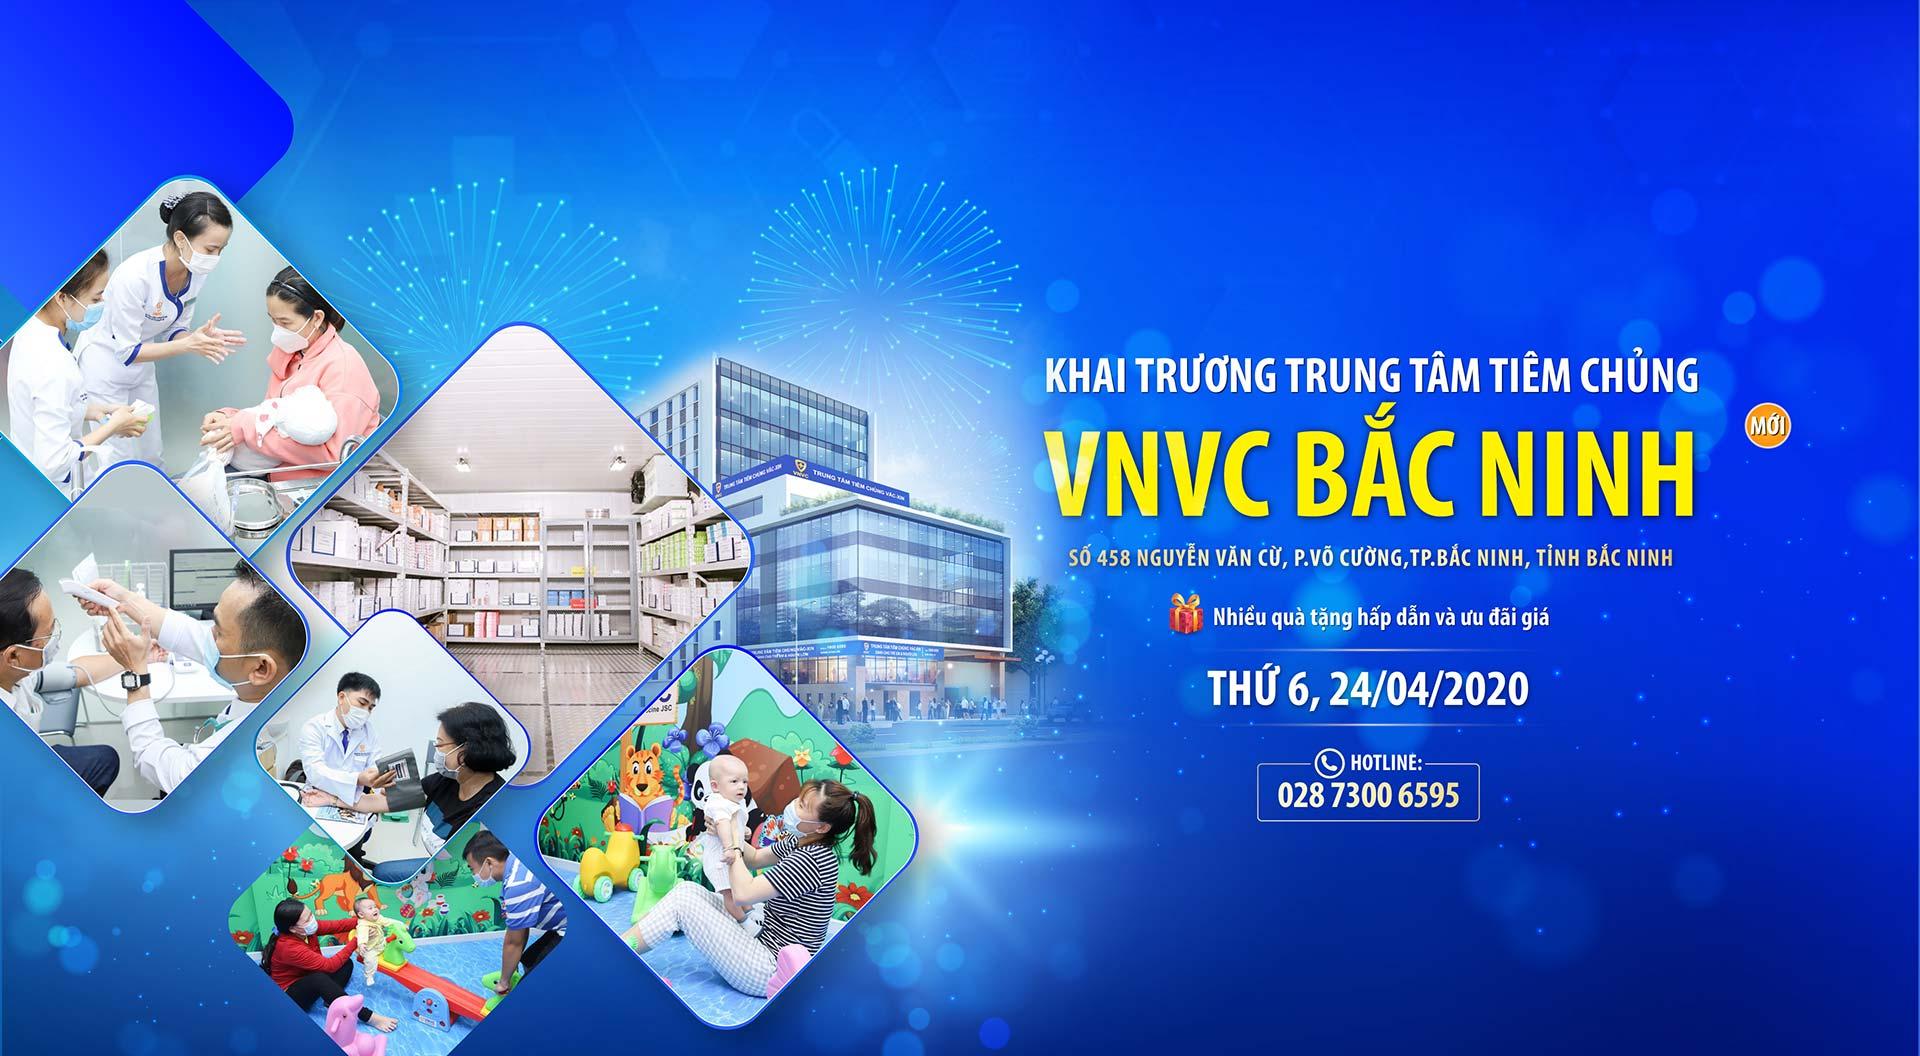 Khai trương VNVC Bắc Ninh desk